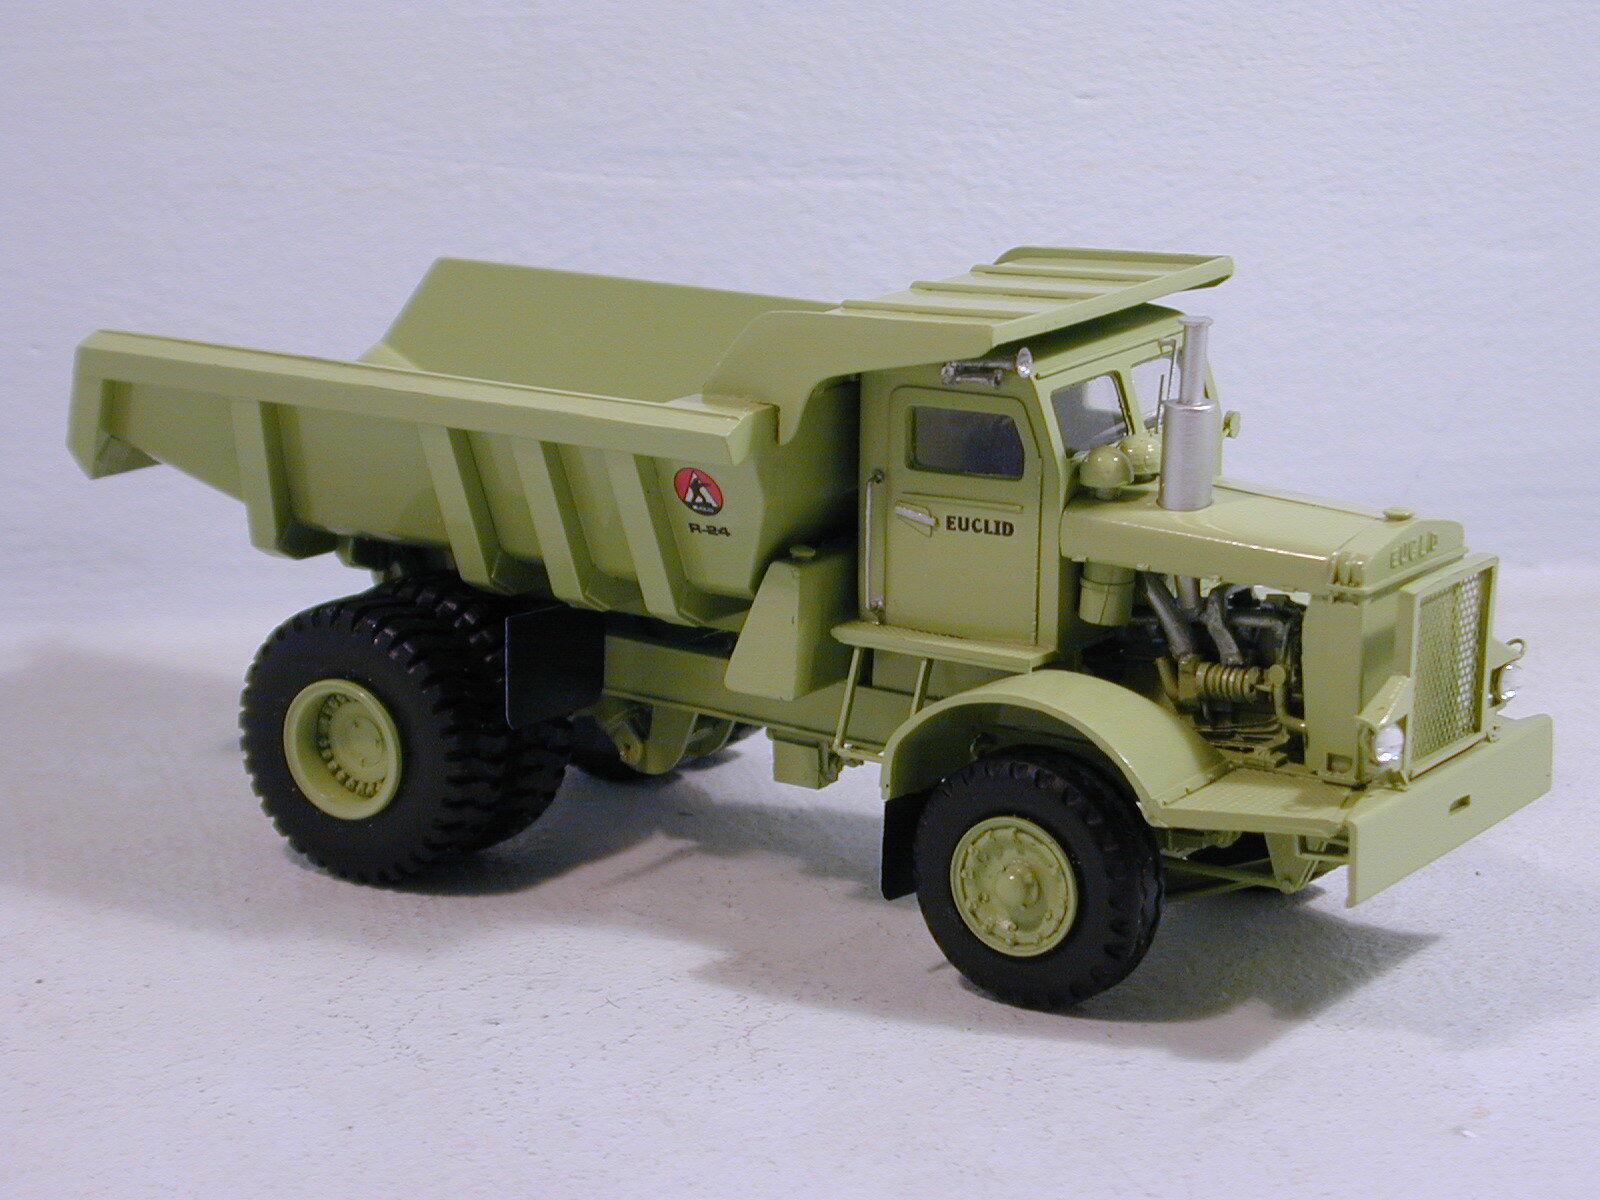 1 50 Euclid R-24 Quarry Dump Body - High quality RESIN KIT by Dan Models